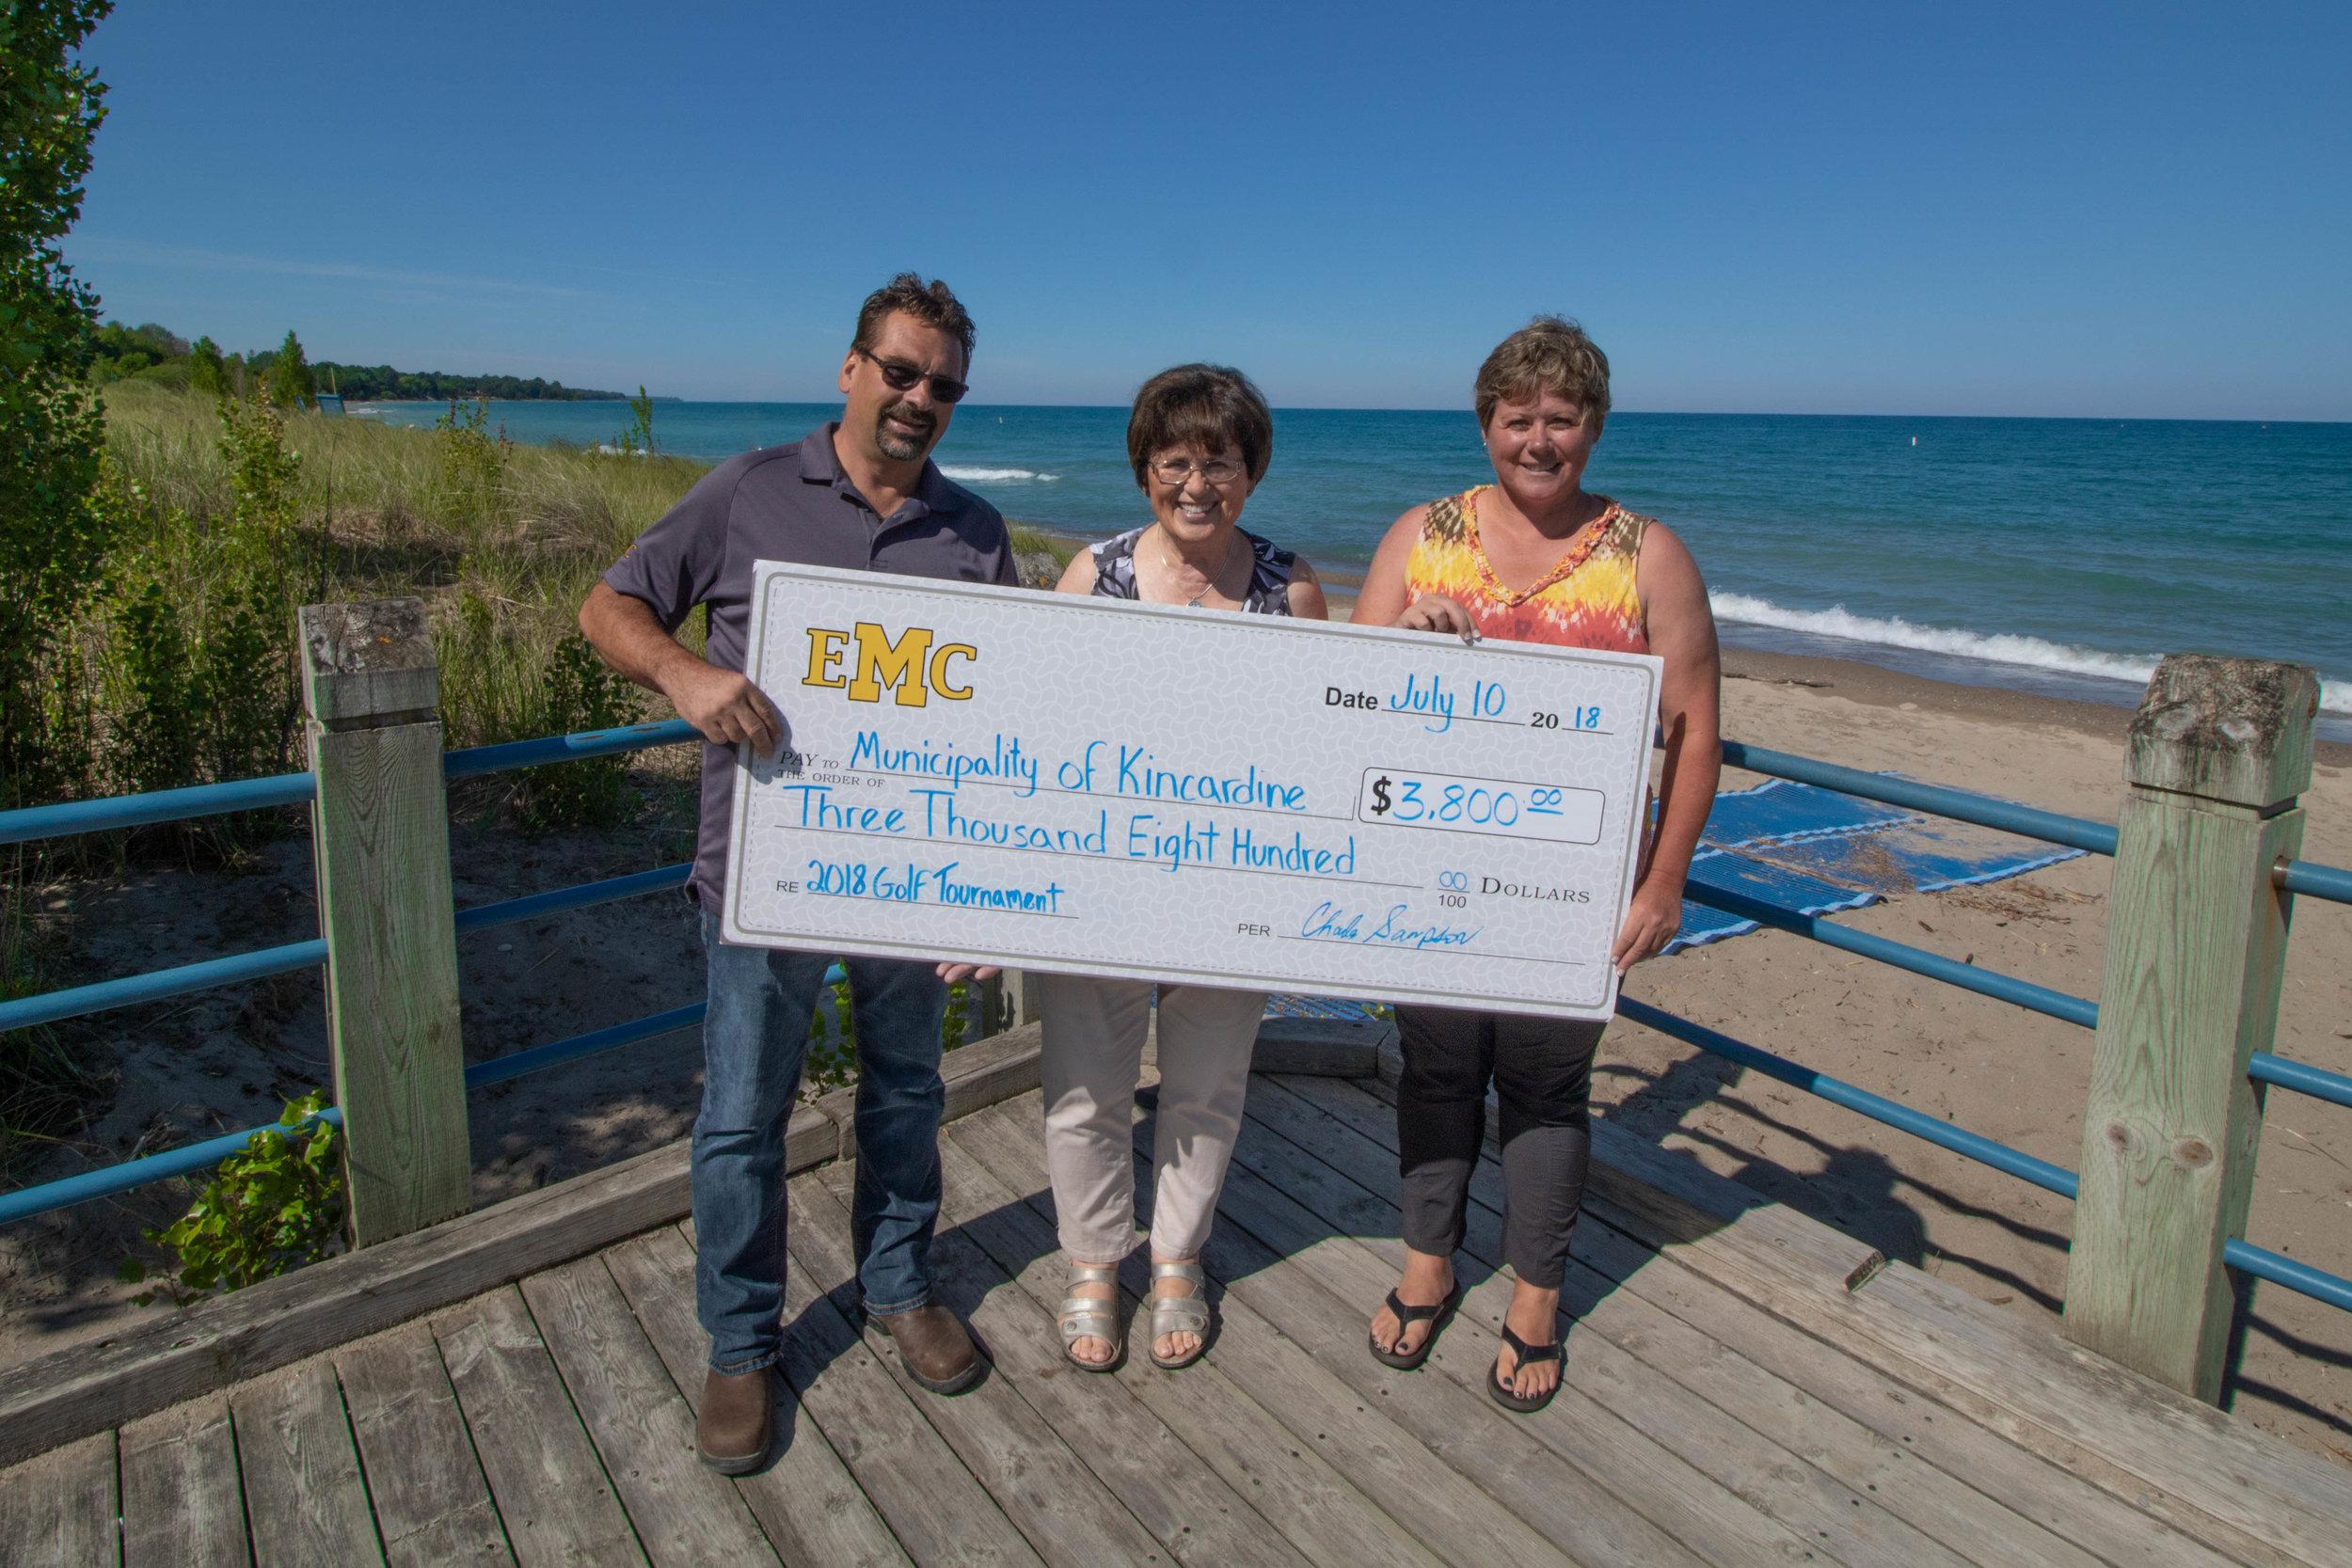 Donation to the Municipality of Kincardine